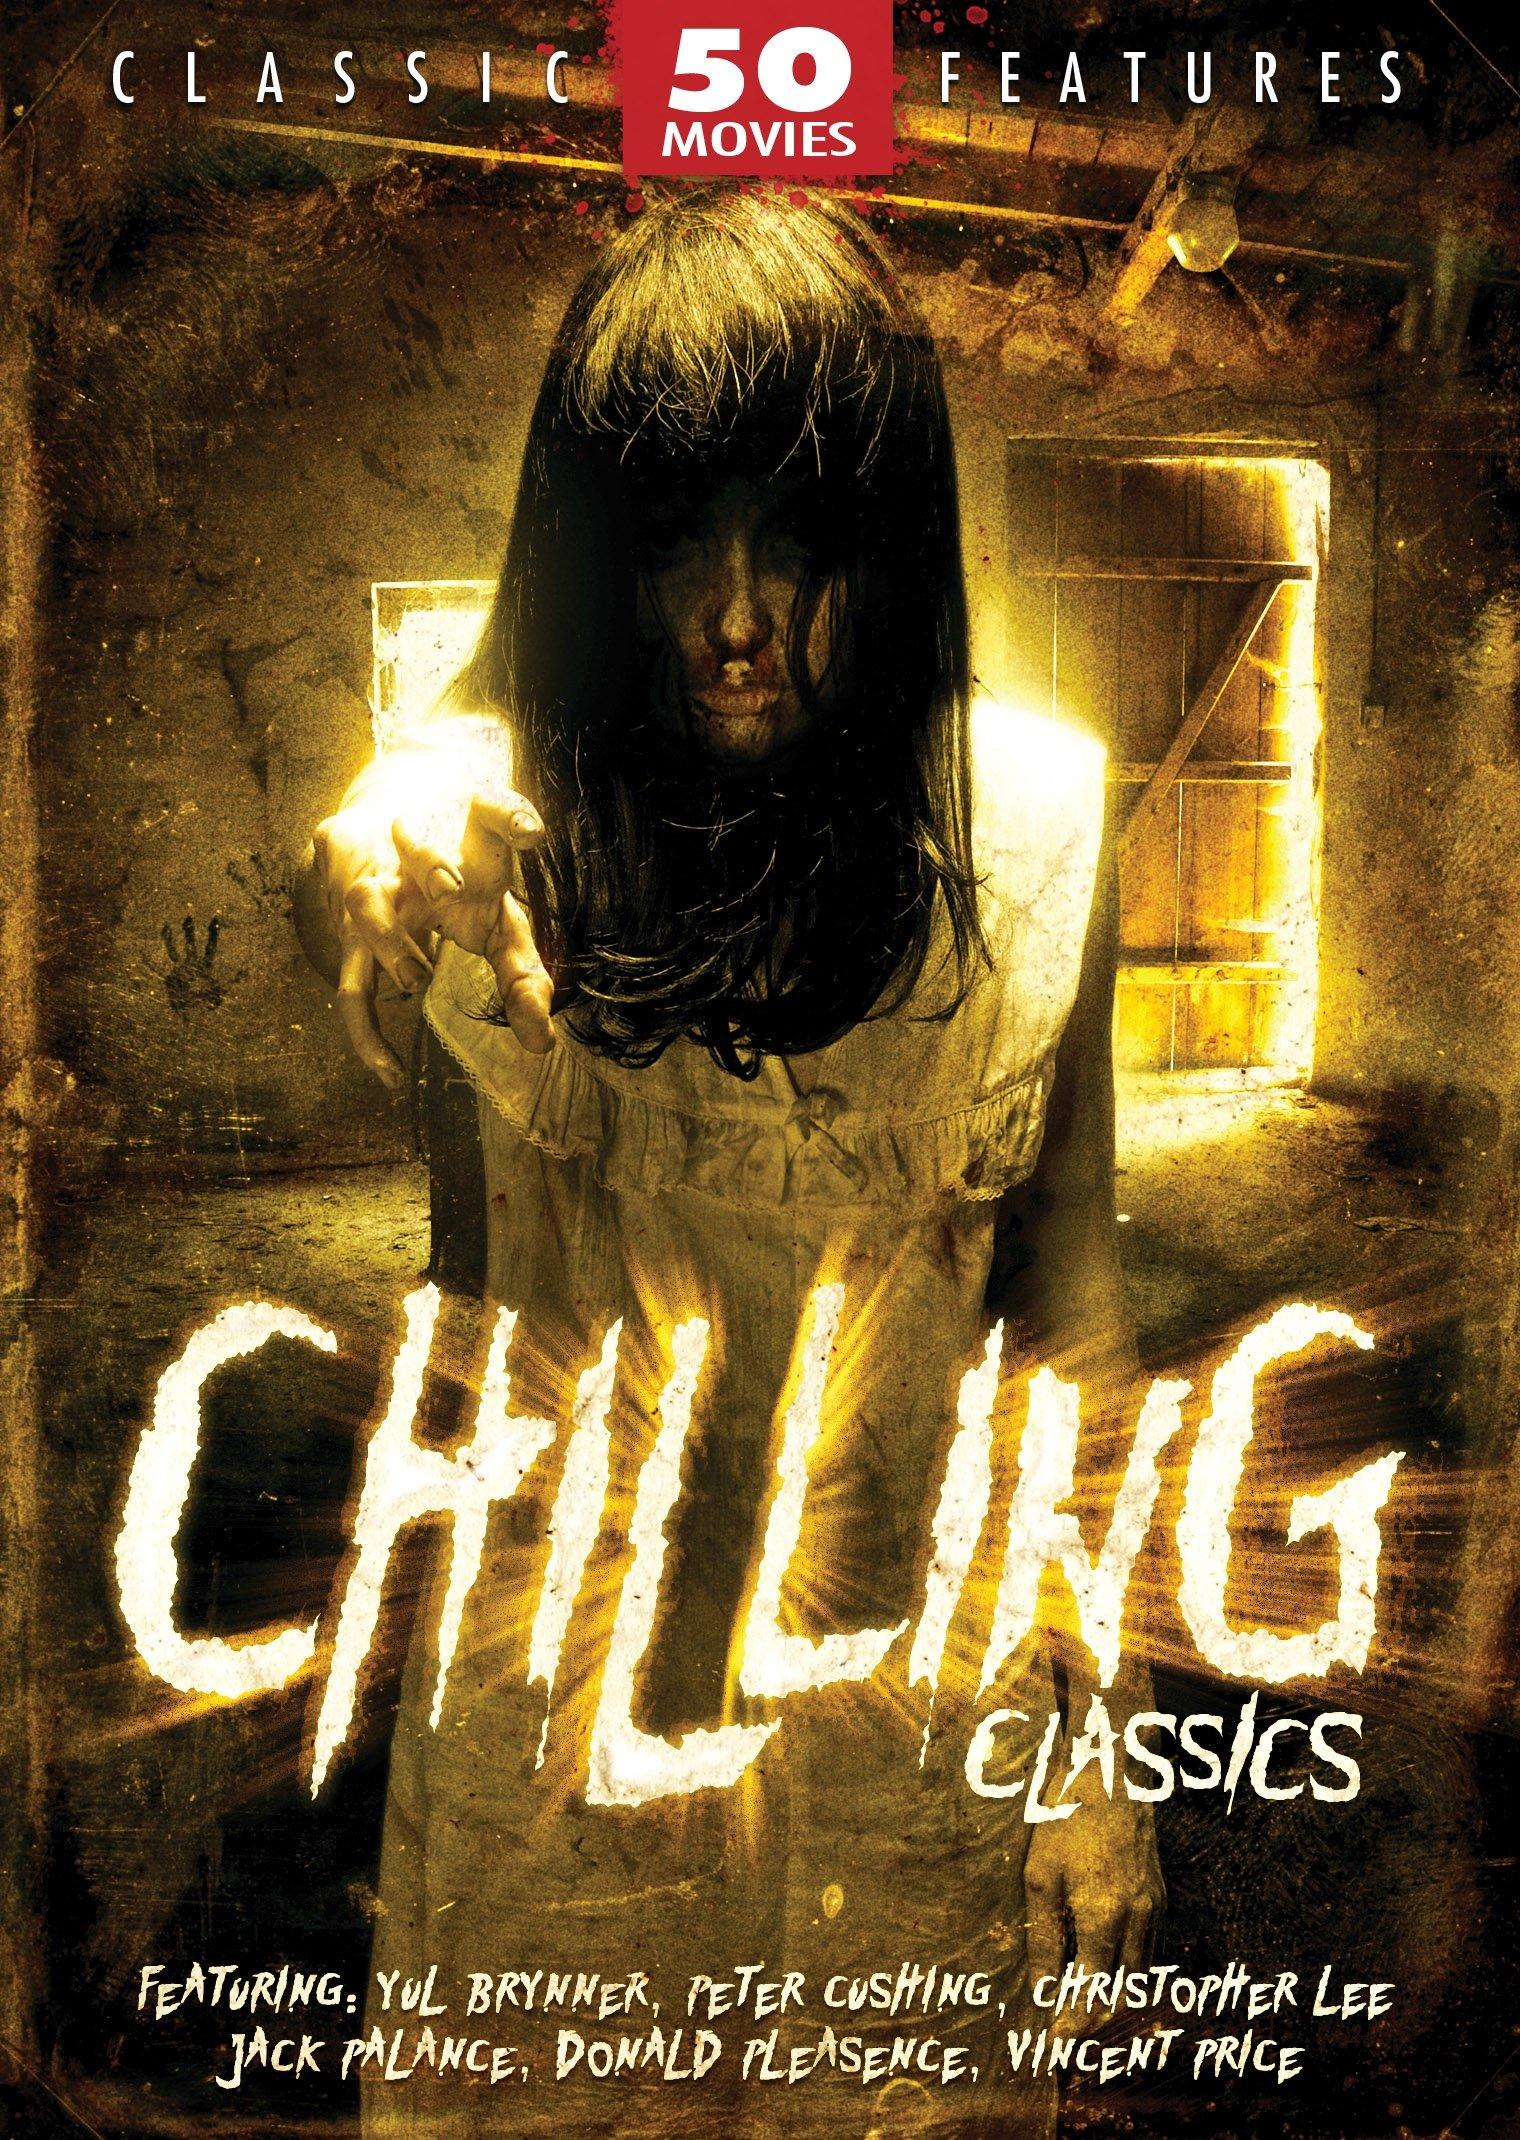 DVD : Chilling Classics (Boxed Set, 12PC)